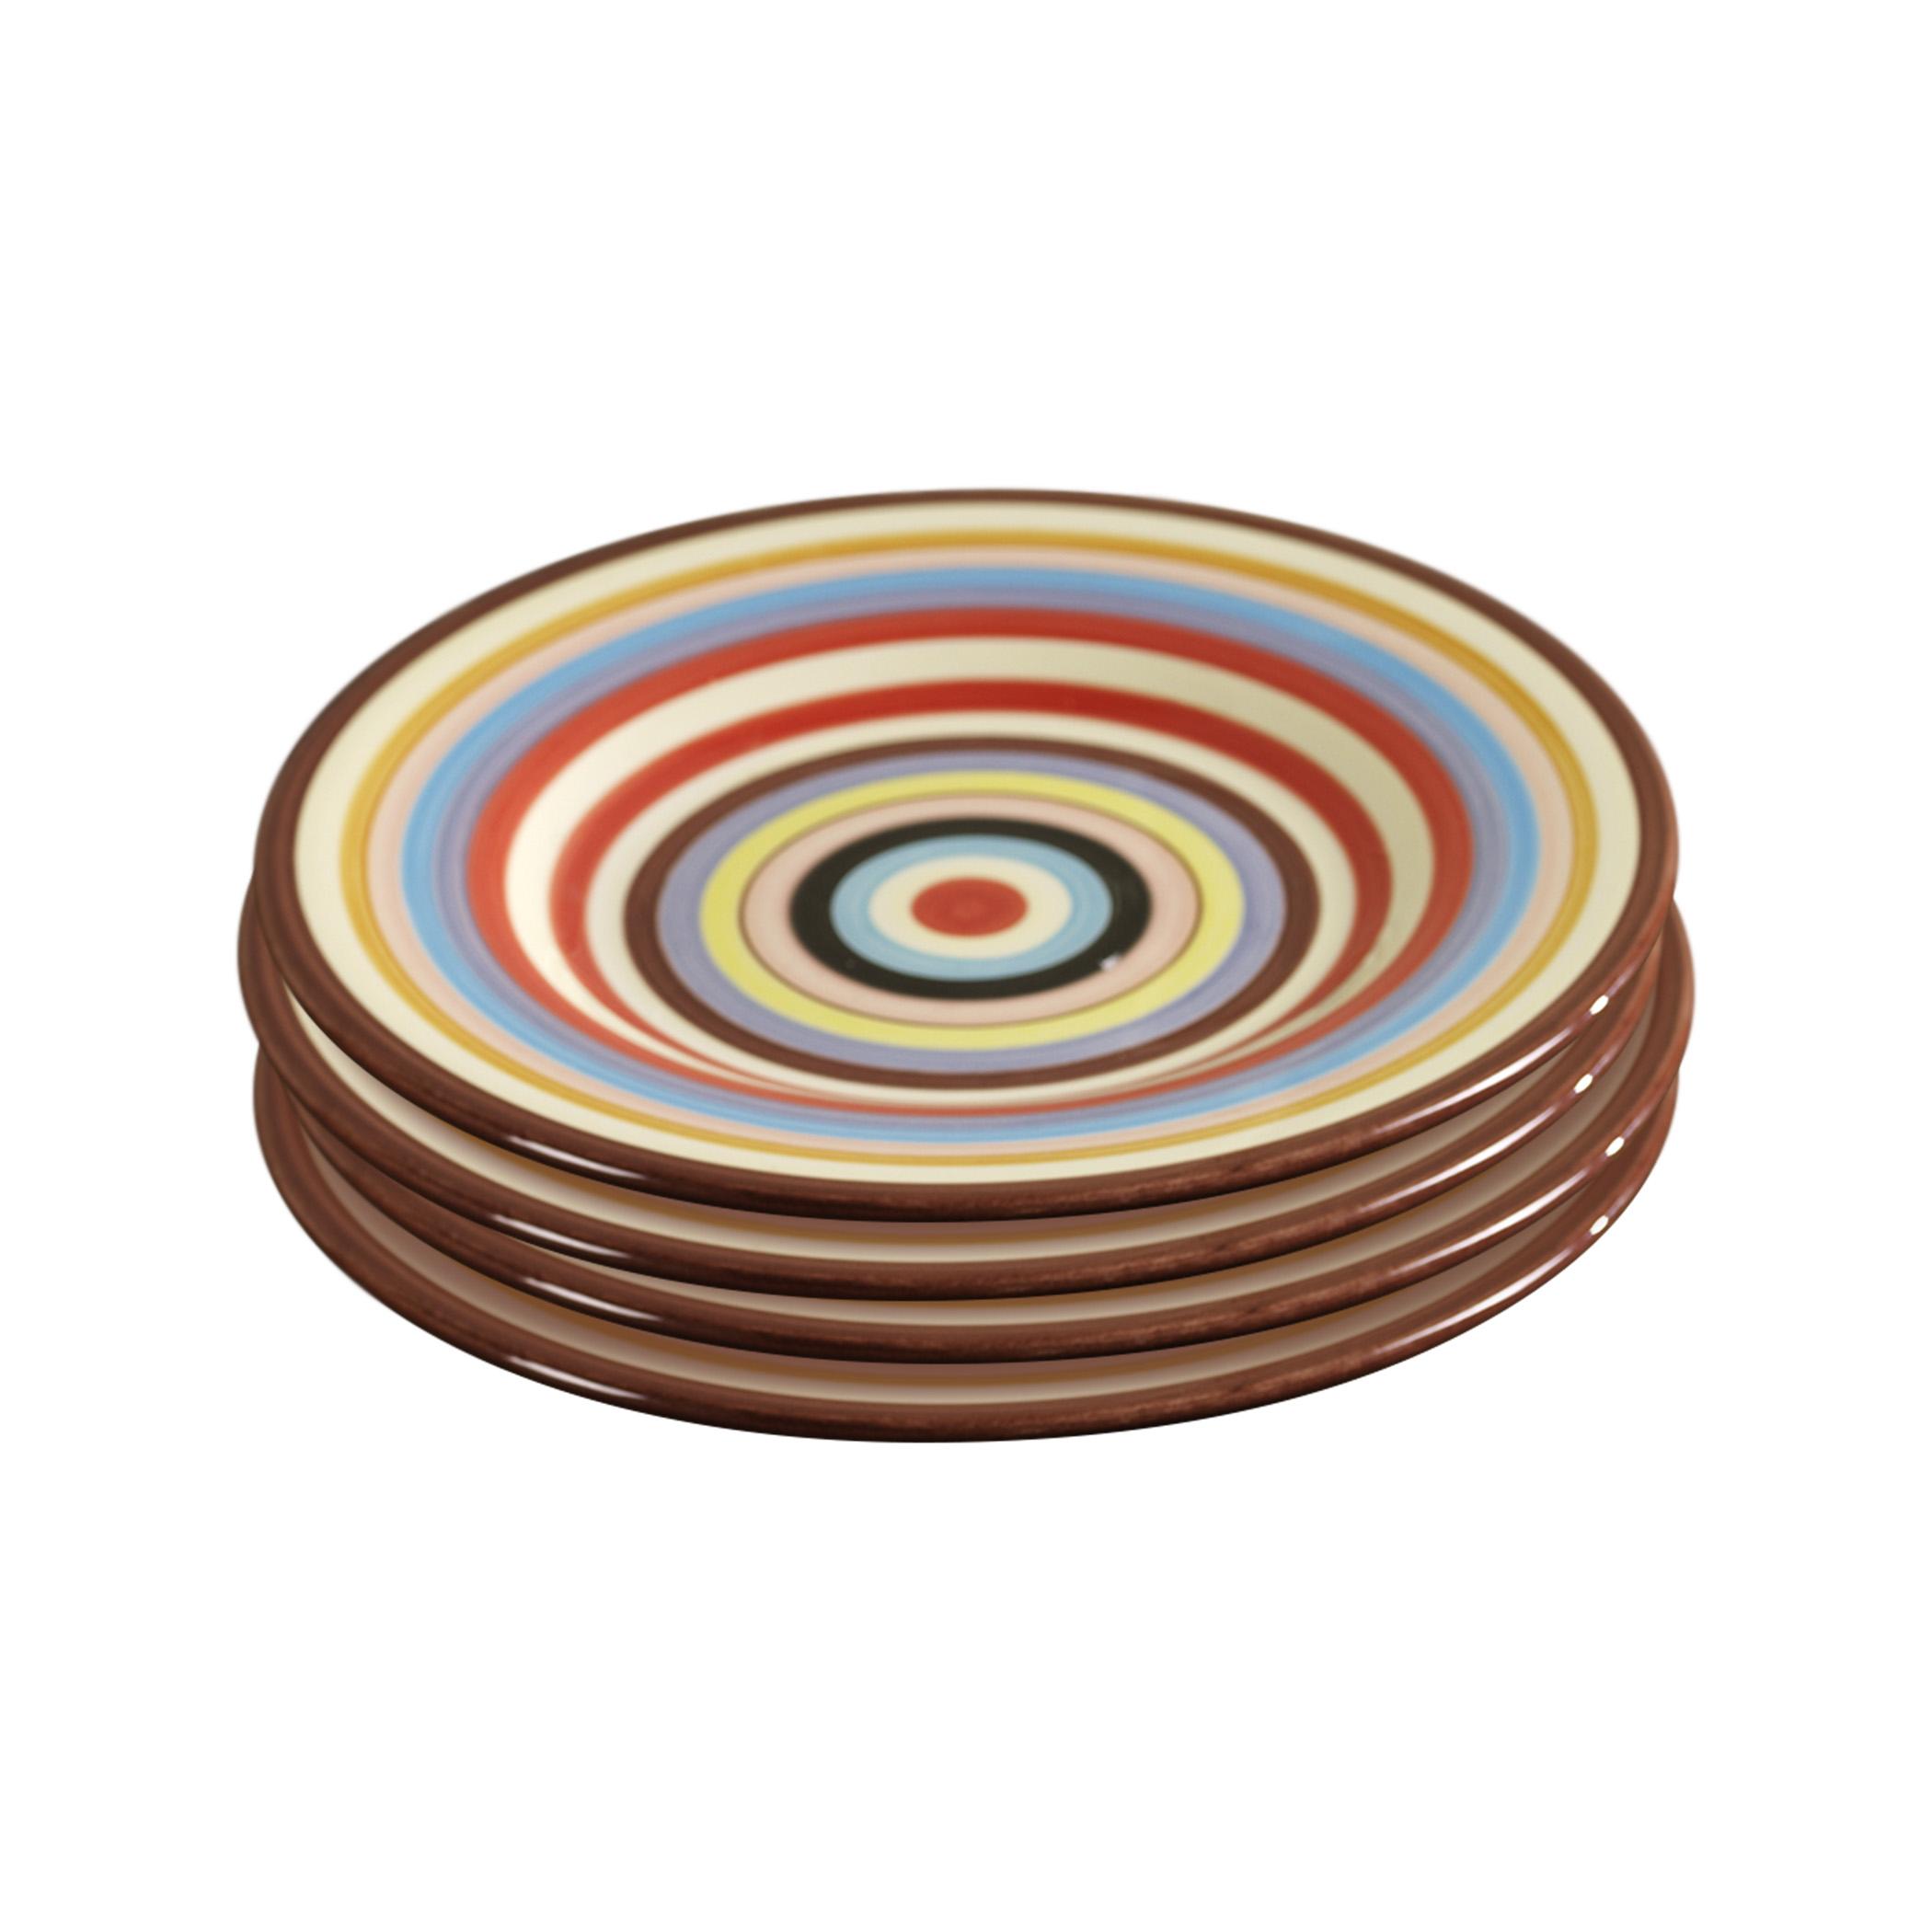 TMS-M6802-EC-Sedona Set of Four 8.75 Inch Ceramic Salad Plates by ...  sc 1 st  Tabletops Unlimited & Sedona Set of Four 8.75 Inch Ceramic Salad Plates by Tabletops ...